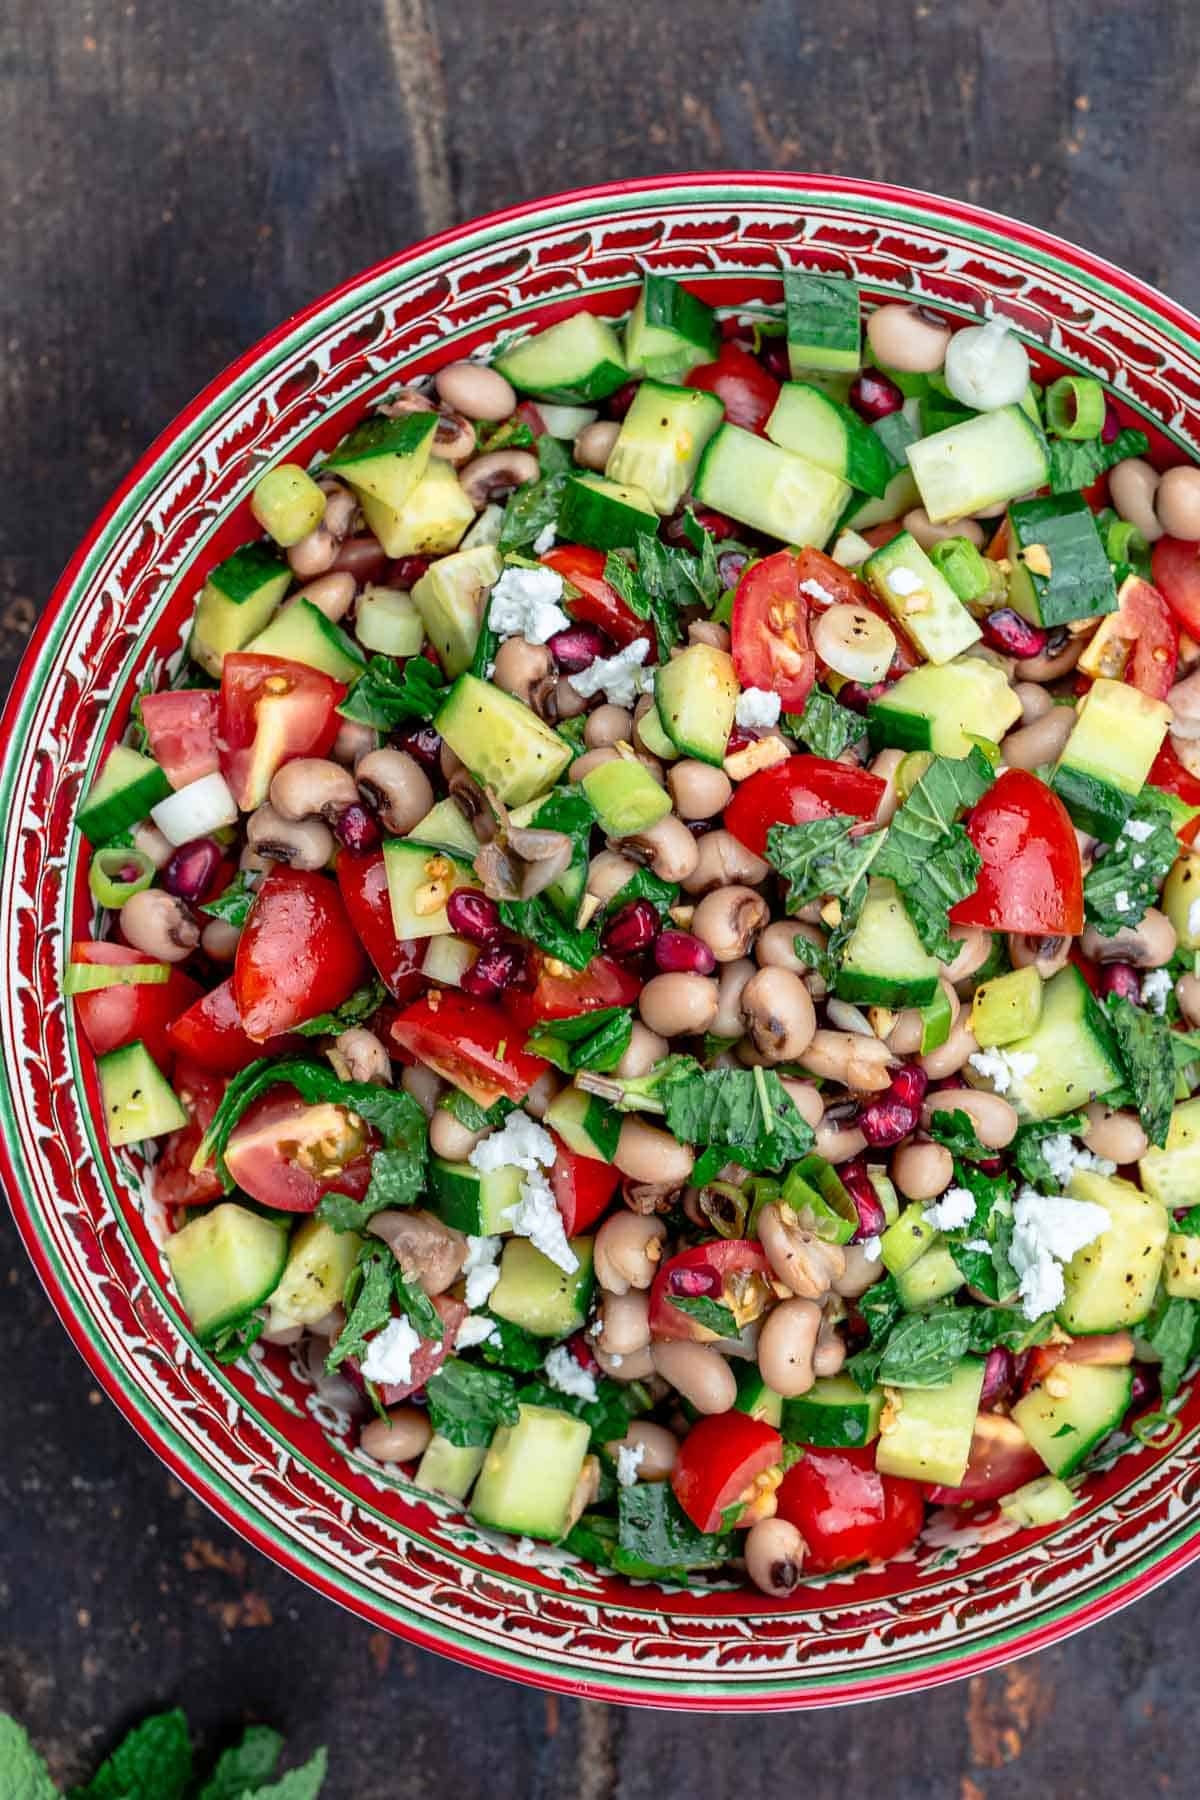 Mediterranean black eyed pea salad